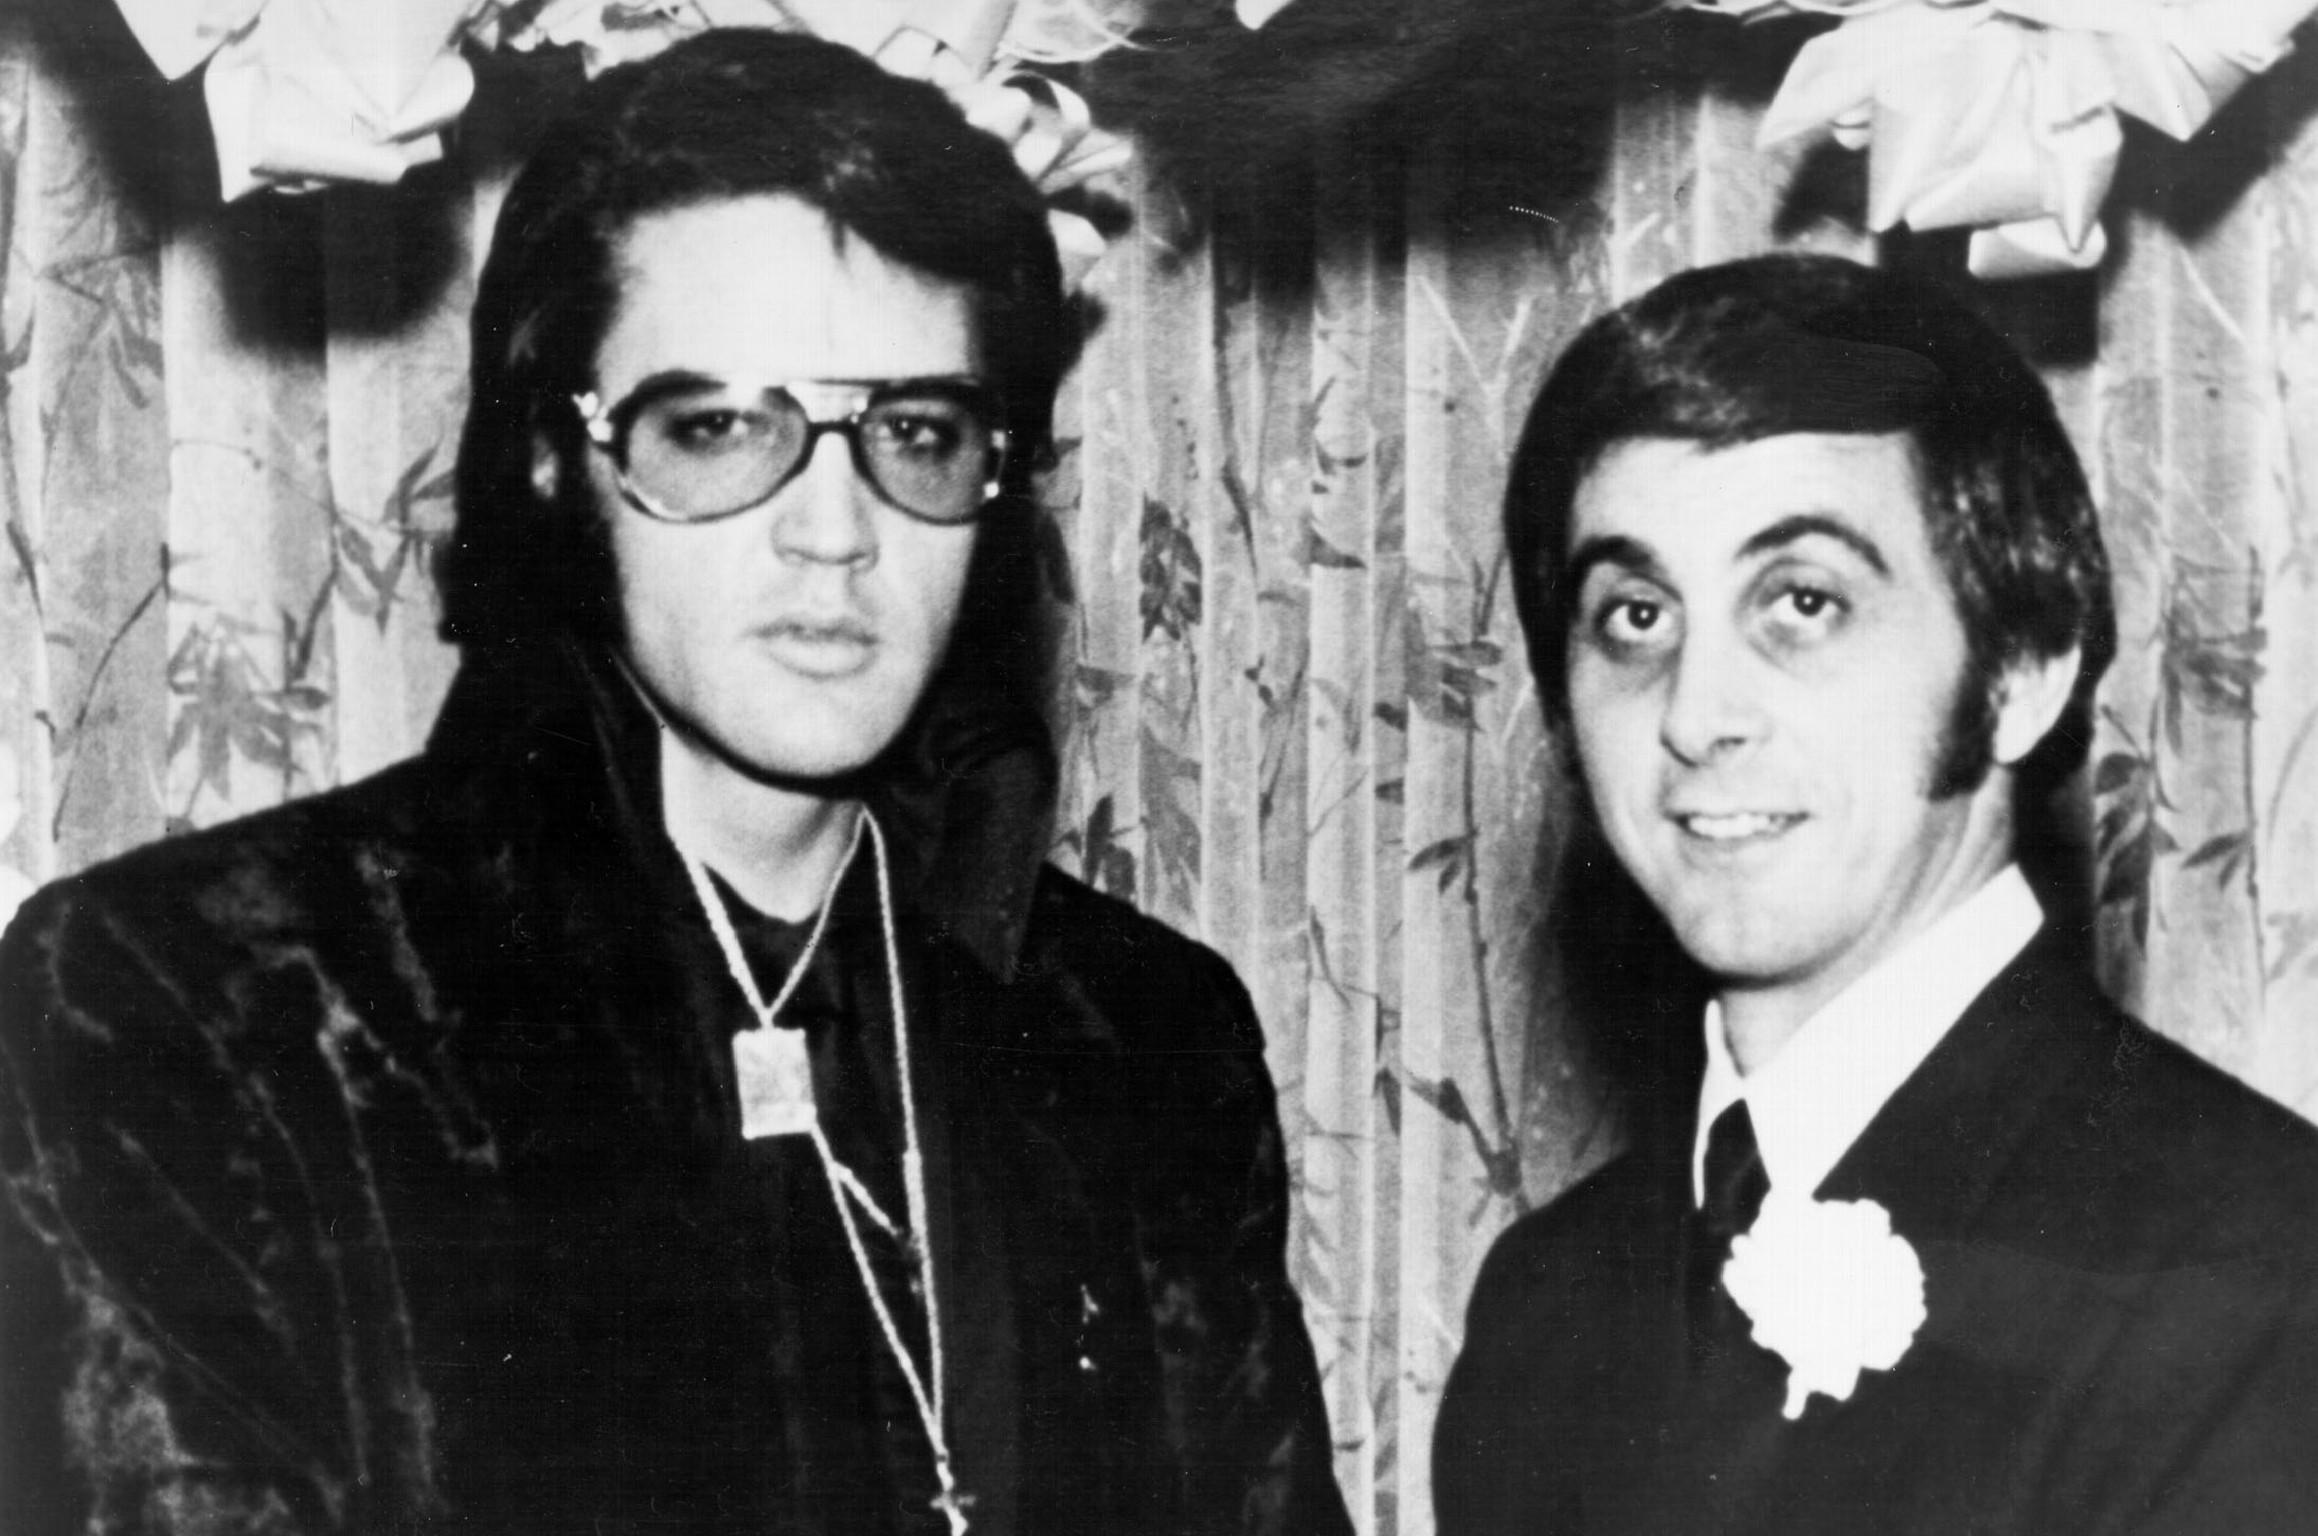 Elvis Presley with radio DJ and high school classmate George Klein in December of 1970 in Memphis, Tennessee.